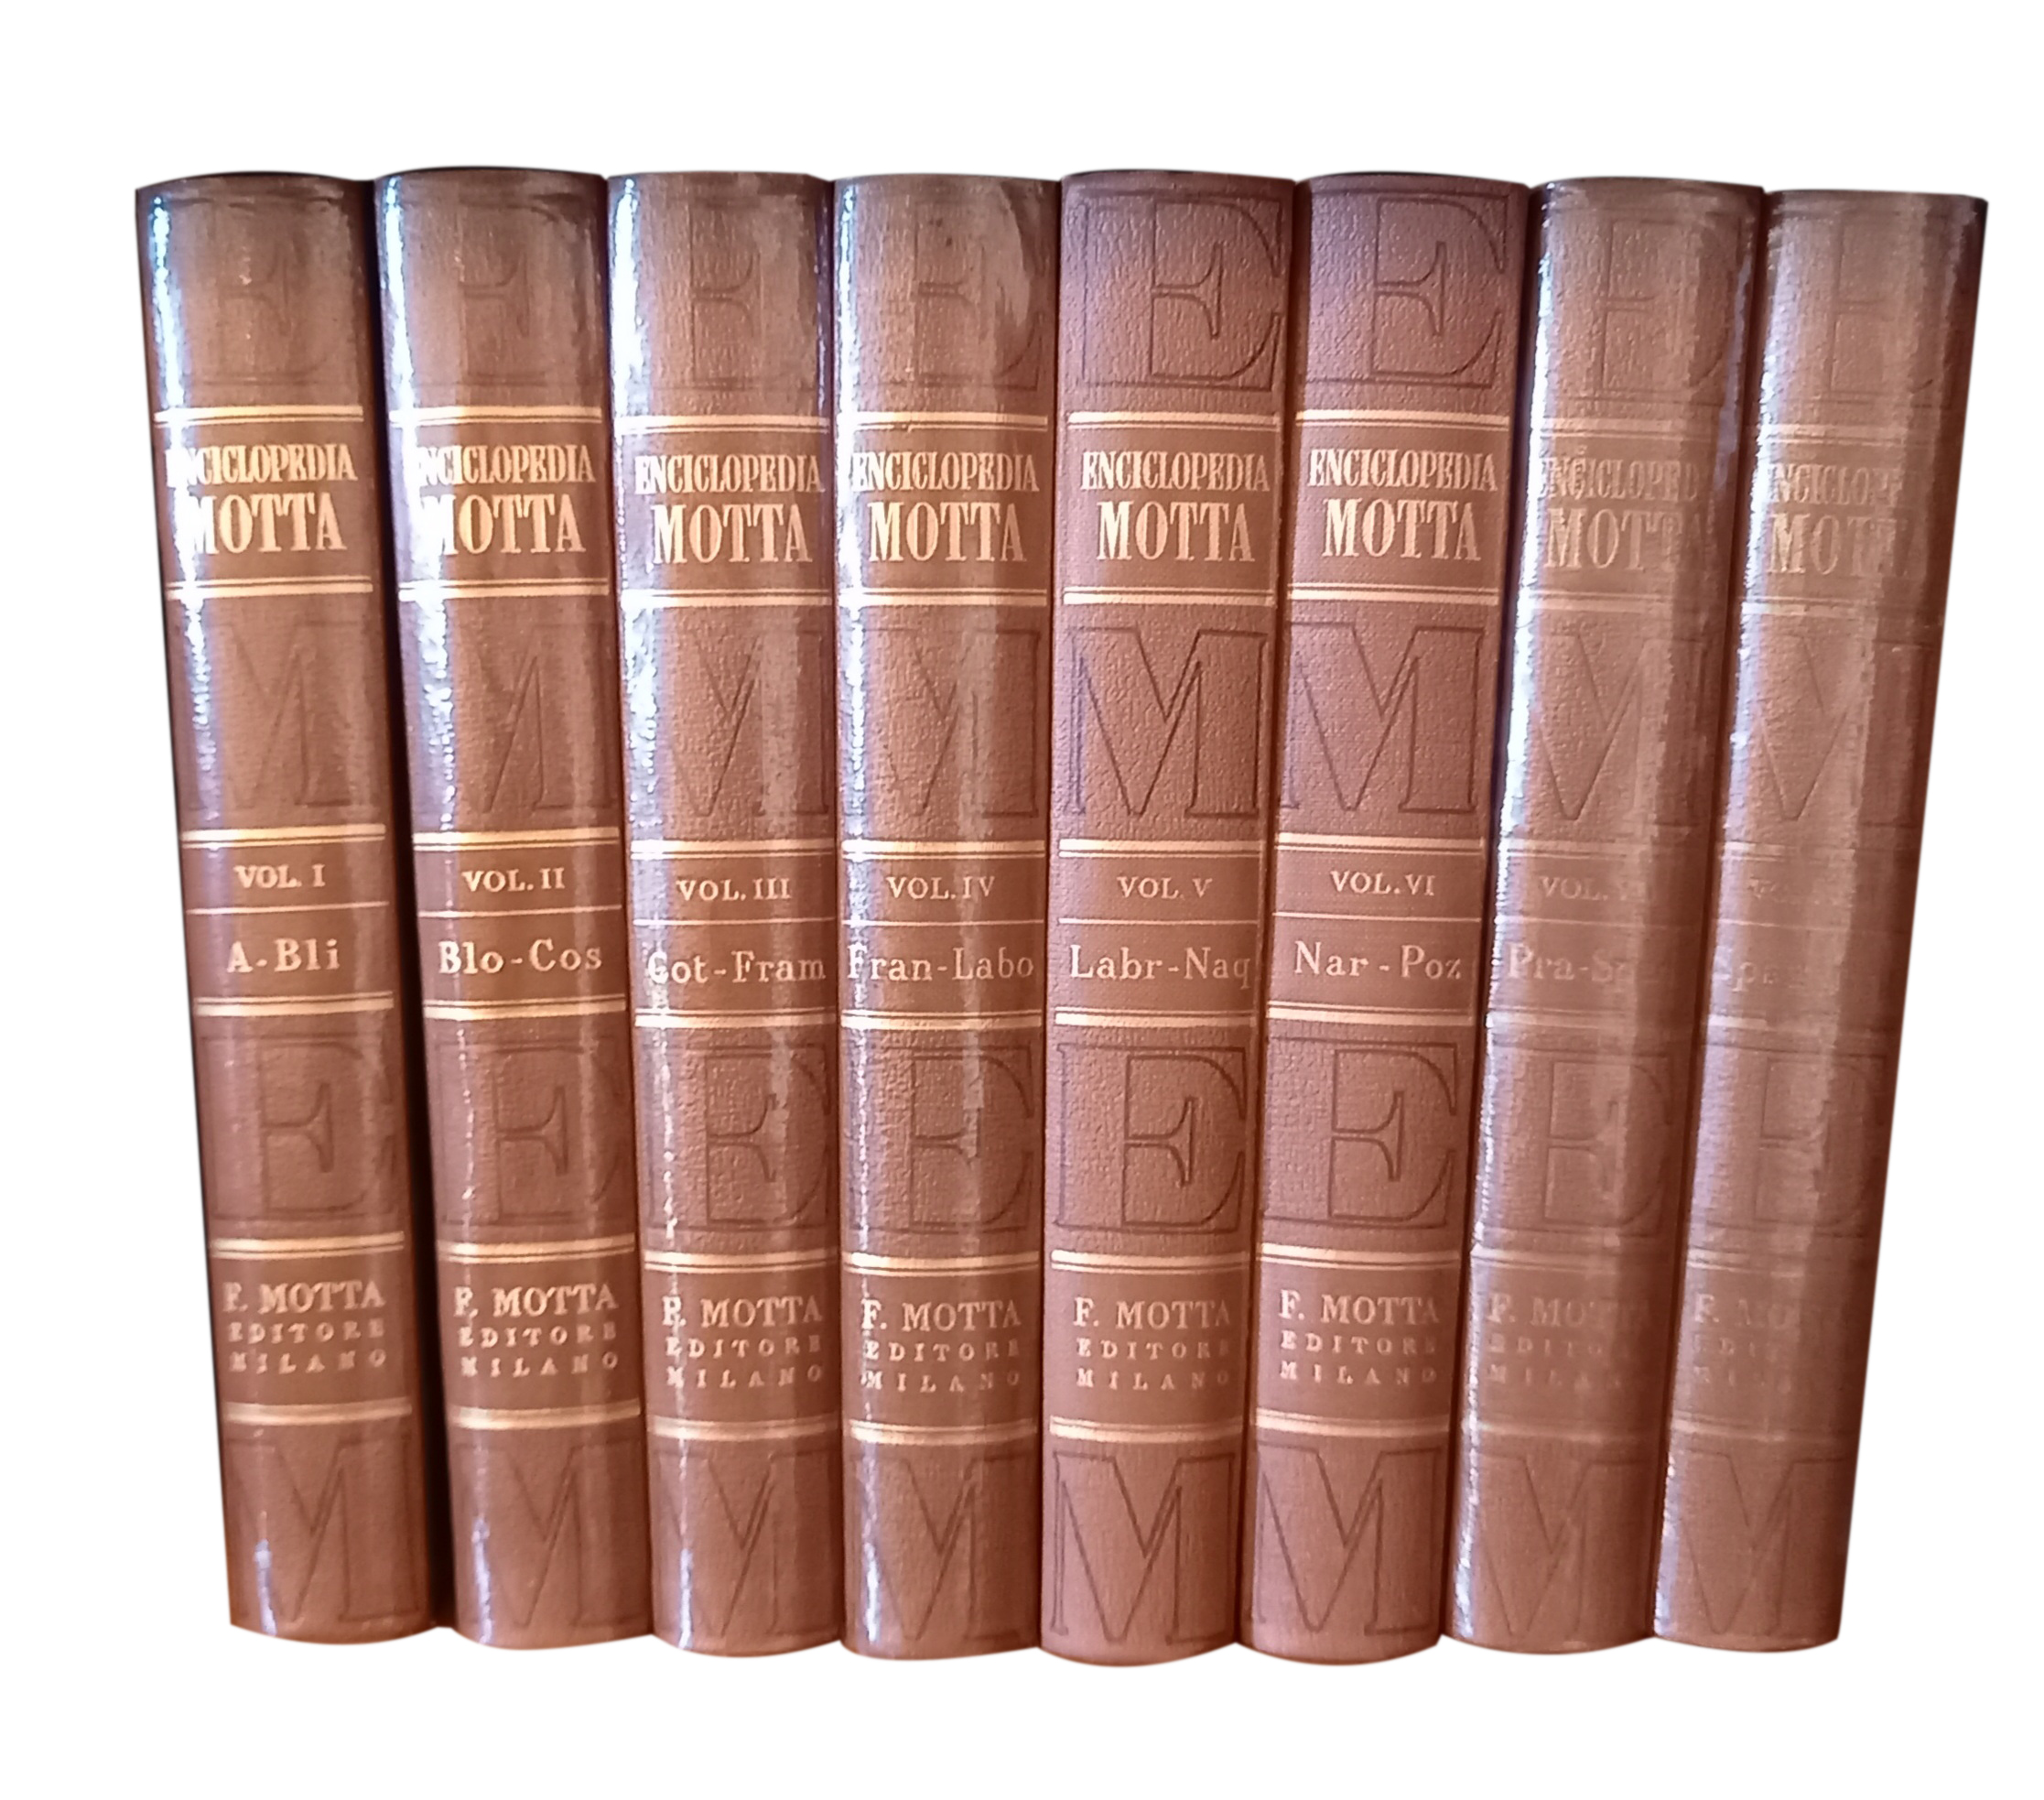 Motta – Enciclopedia Motta anni '80